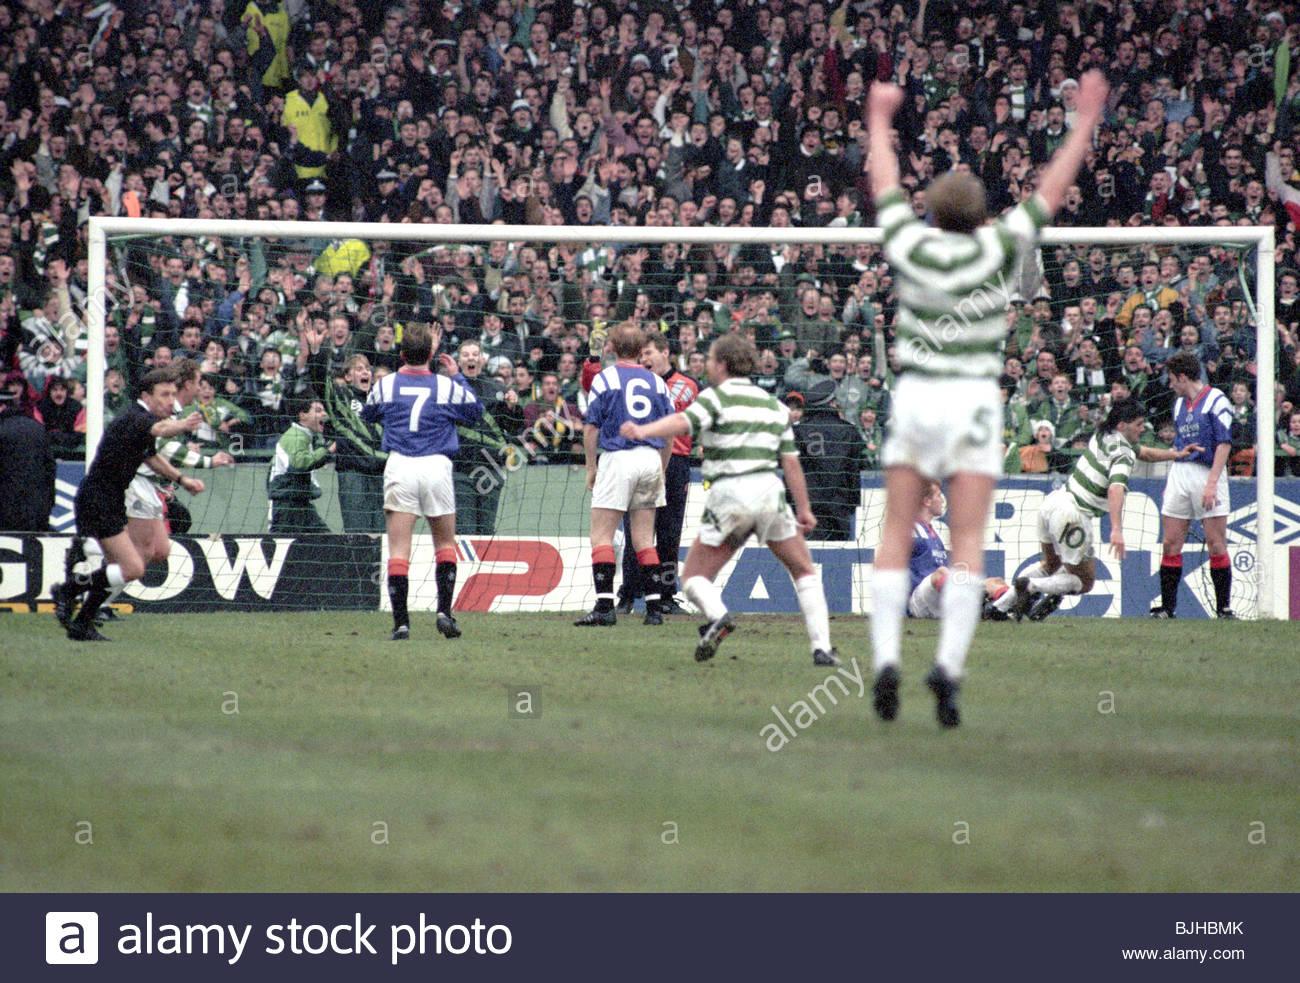 20/03/93 PREMIER DIVISION CELTIC V RANGERS (2-1) CELTIC PARK - GLASGOW Celtic's Andy Payton (10, 2nd right) - Stock Image